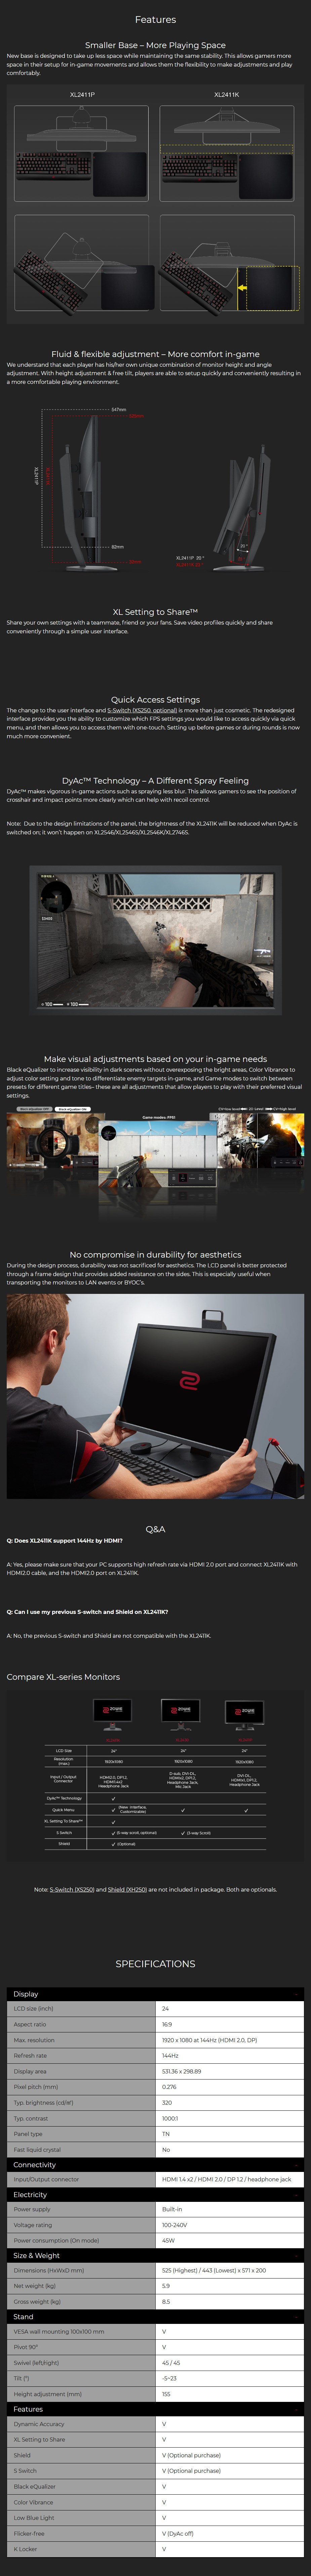 benq-zowie-xl2411k-24-144hz-full-hd-dyac-tn-gaming-monitor-ac38966-8.jpg